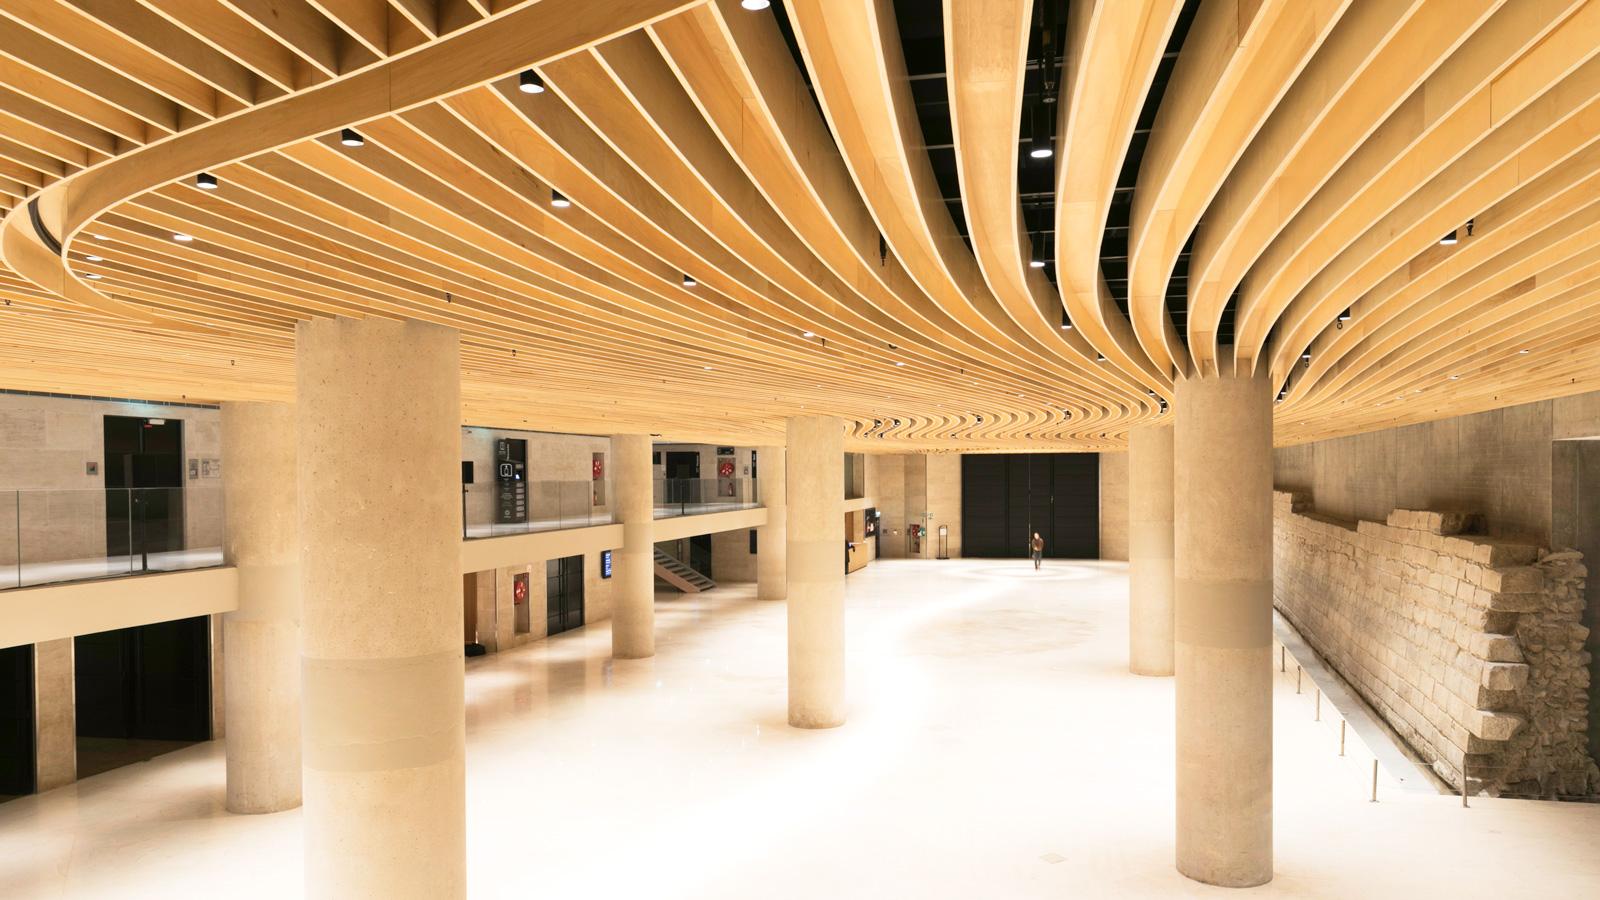 Perspective Escalier : Louvre plafond bois intumescent m woodenha portfolio